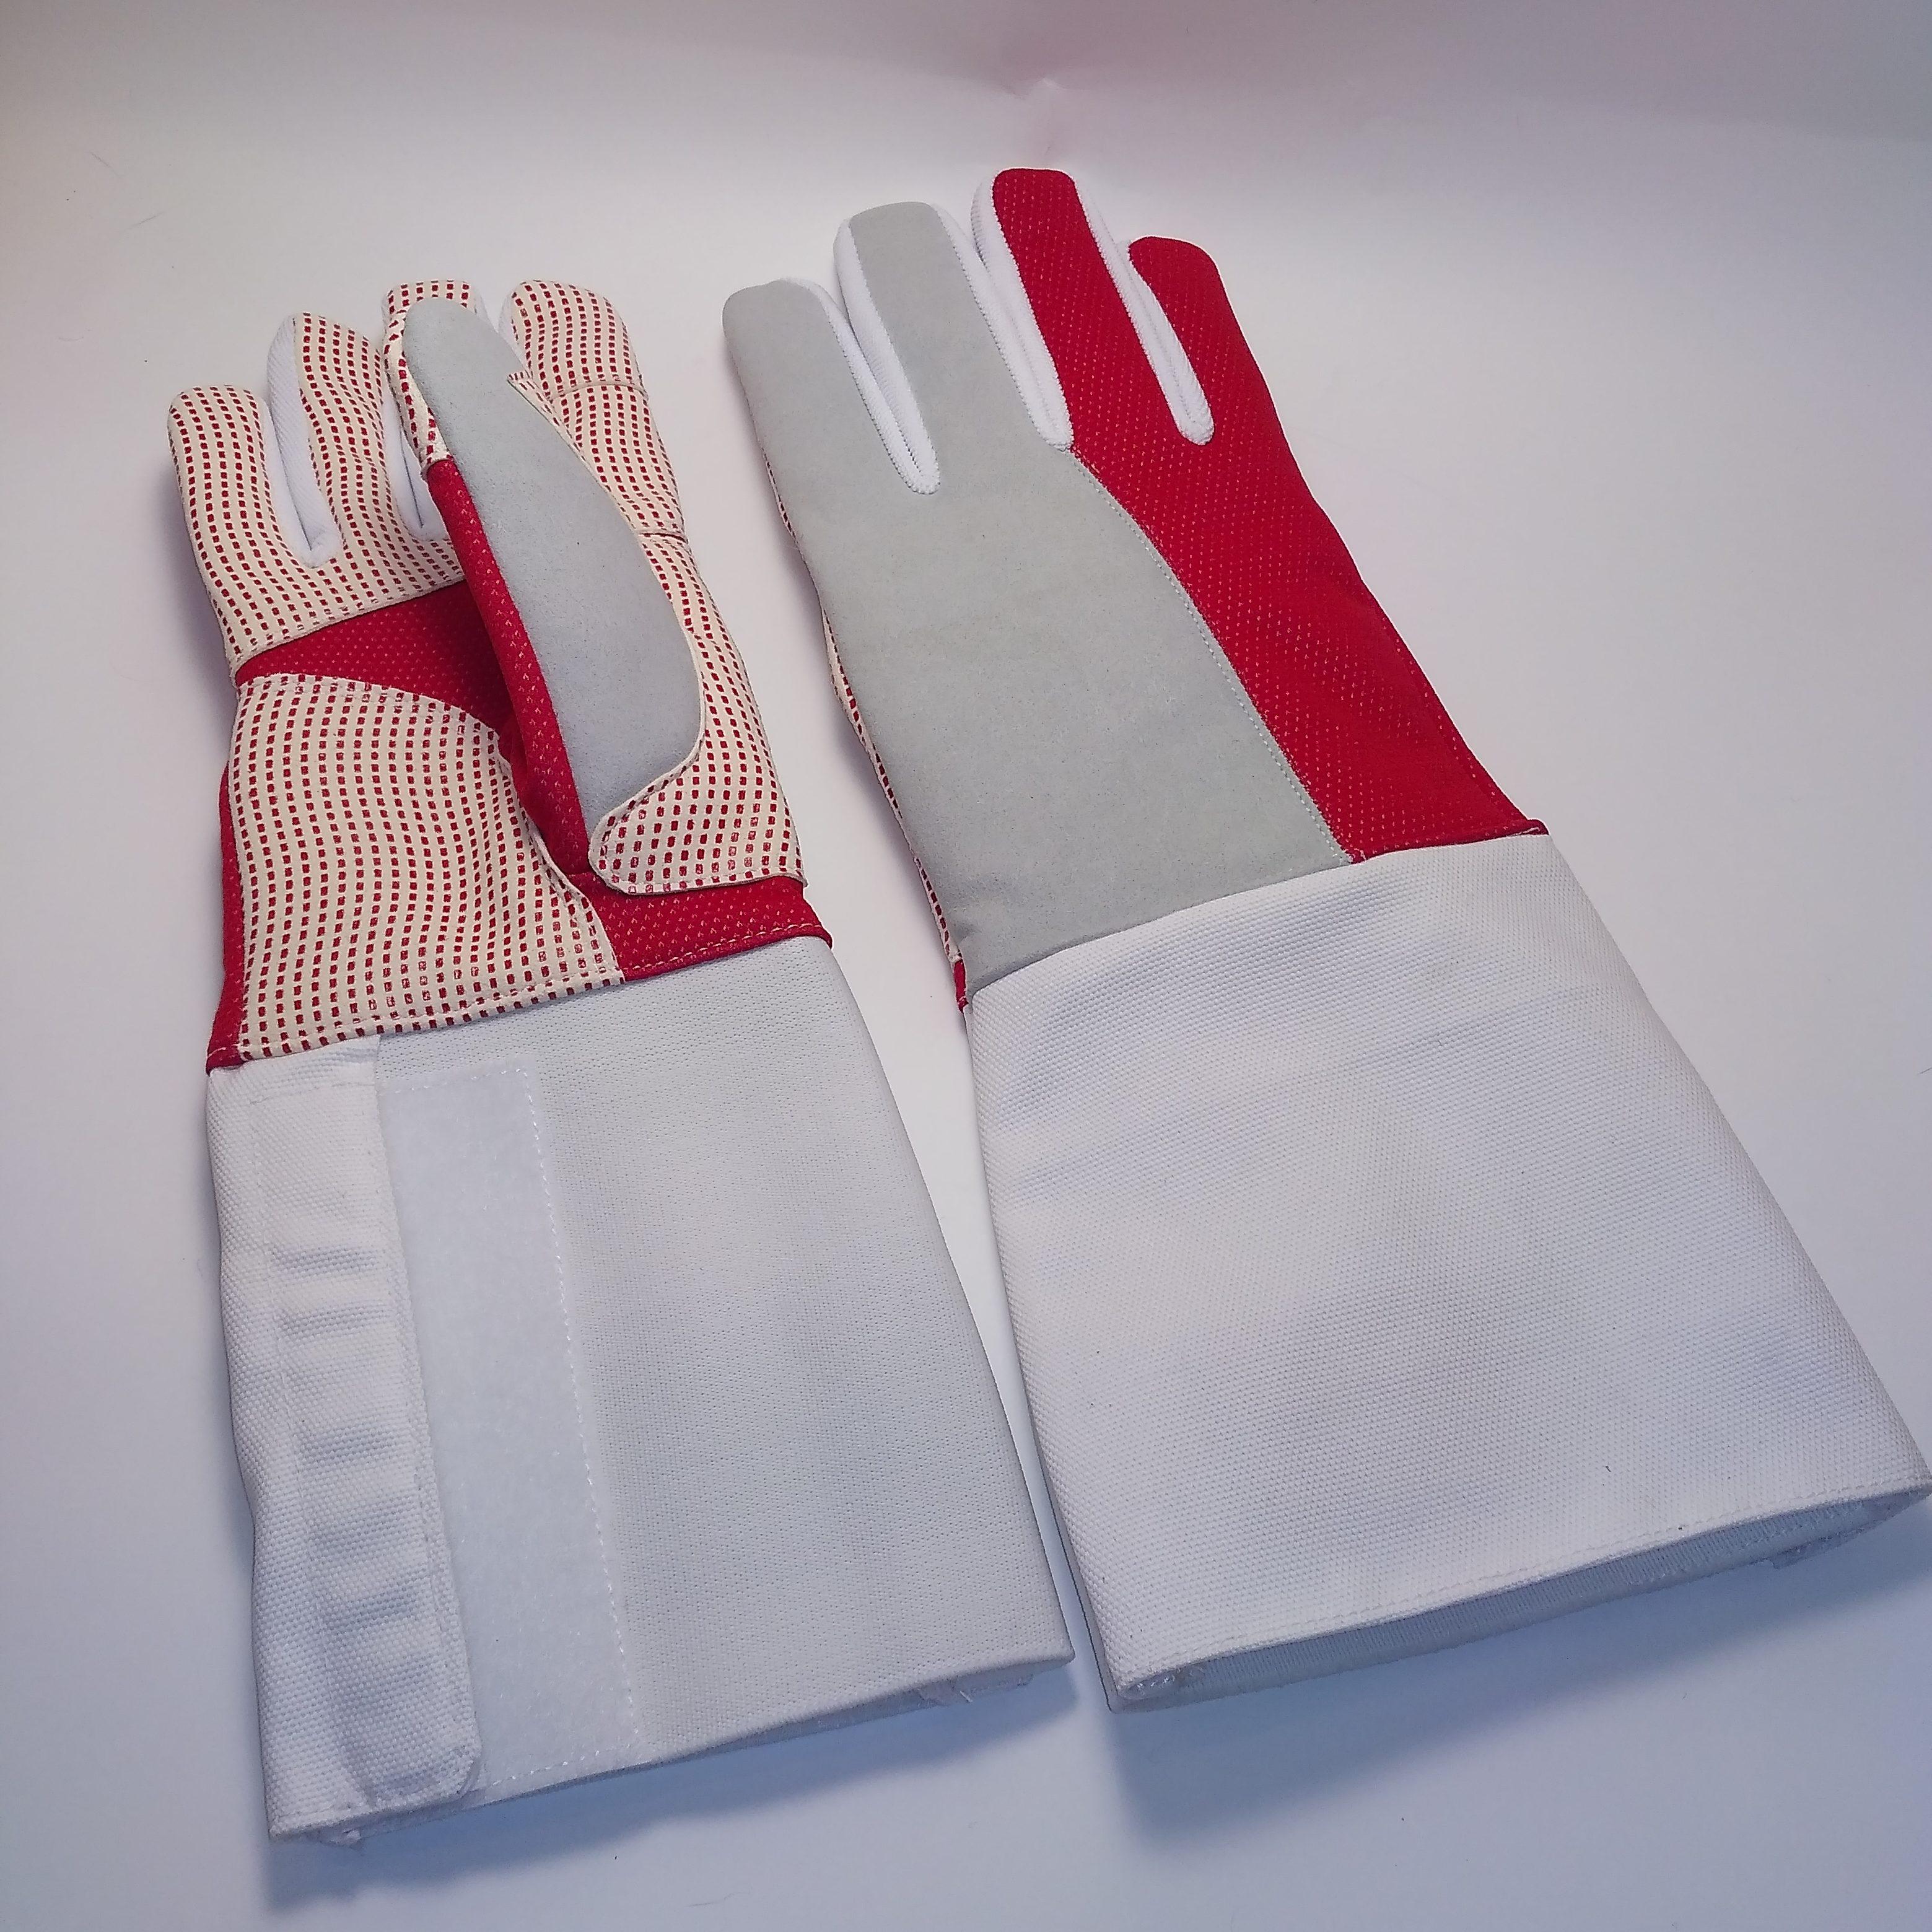 Перчатка с частично нескользящим покрытием КОМБИ Шпага_рапира_AME-04